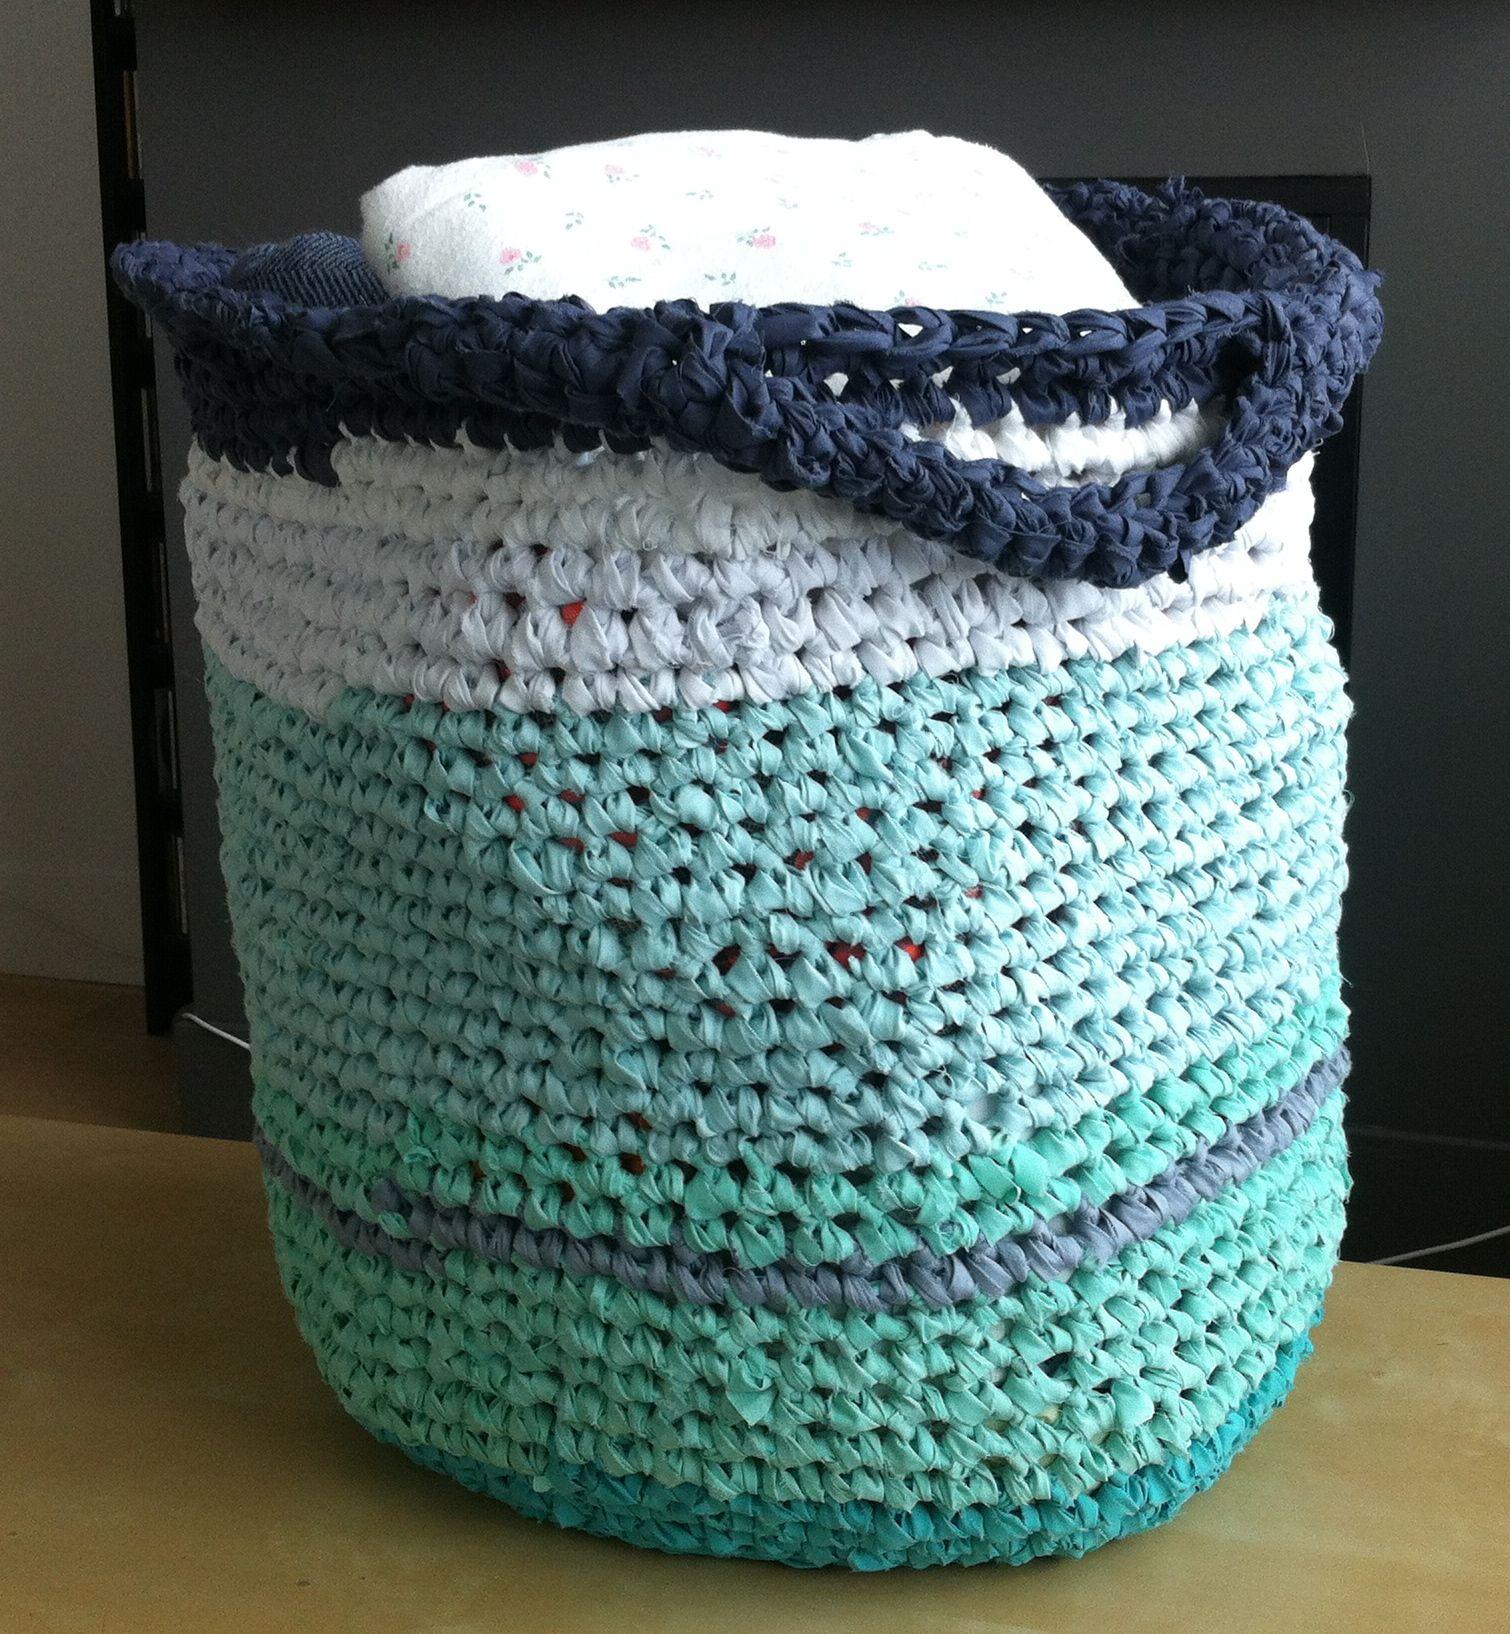 Youtube Rag Rug: Crocheted Rag Rugs Directions